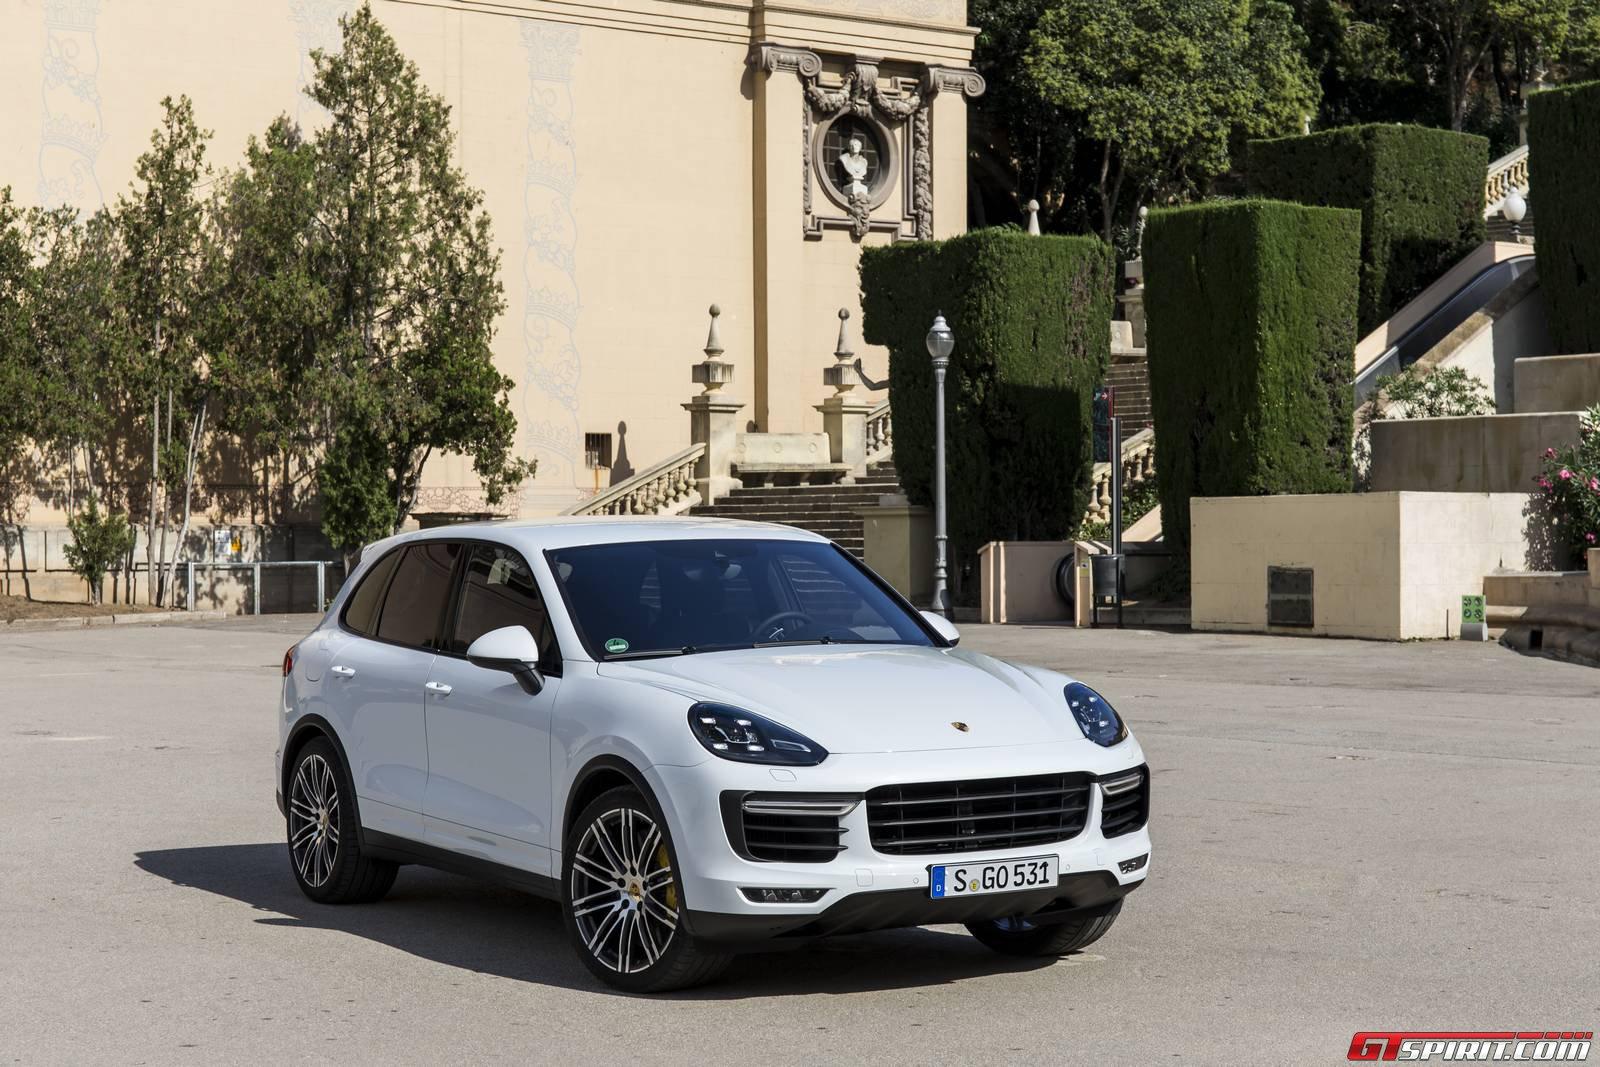 porsche cayenne turbo carrara white metallic - Porsche Cayenne Turbo White